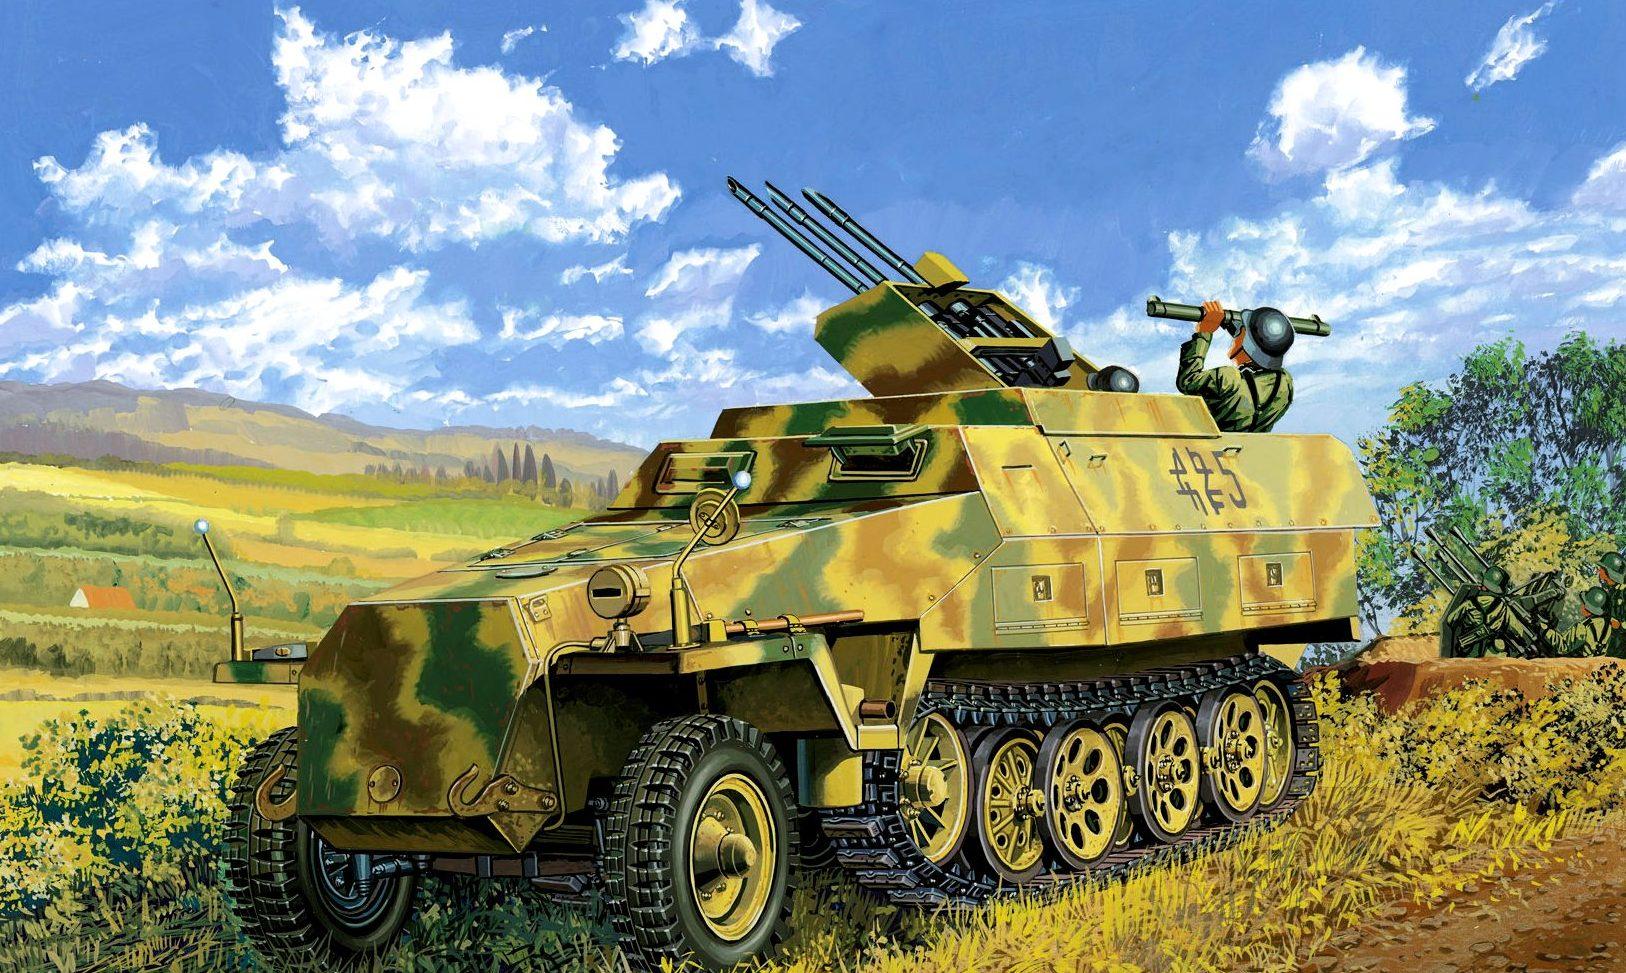 Satake Masao. Бронетранспортер Sd.Kfz. 251/21 Ausf. D.